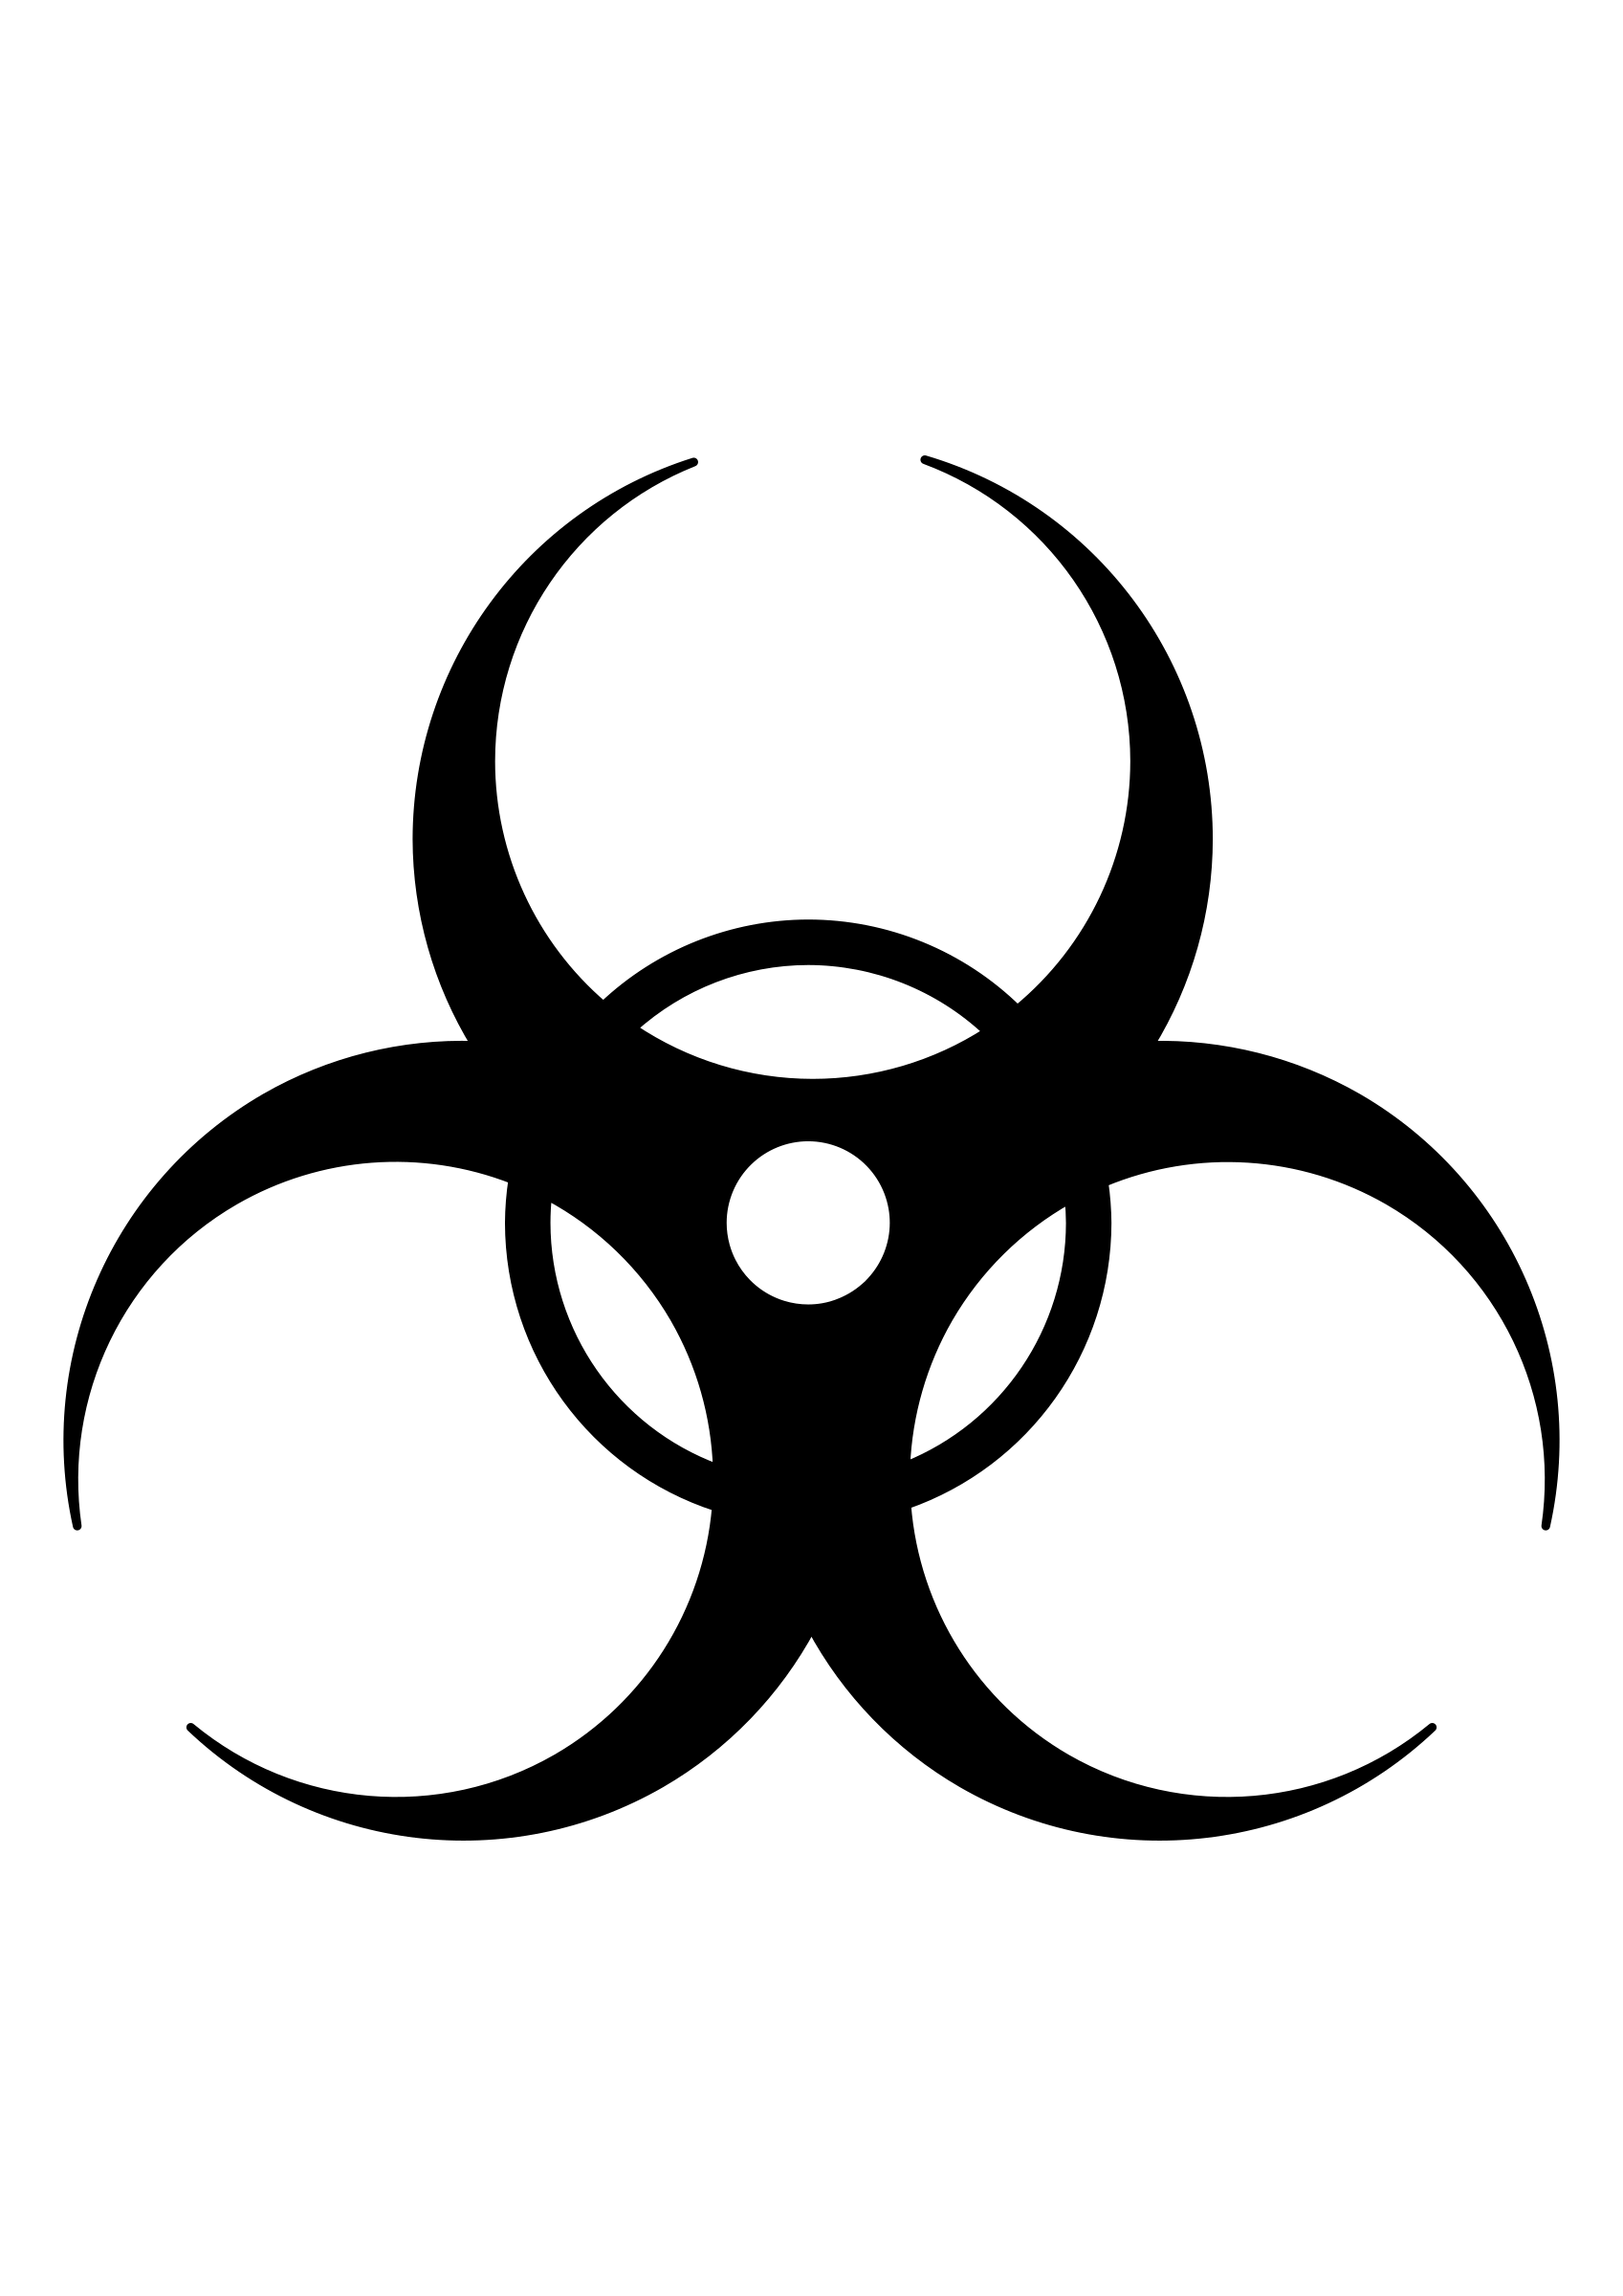 Biohazard Symbol Png Transparent Biohazard Symbolg Images Pluspng